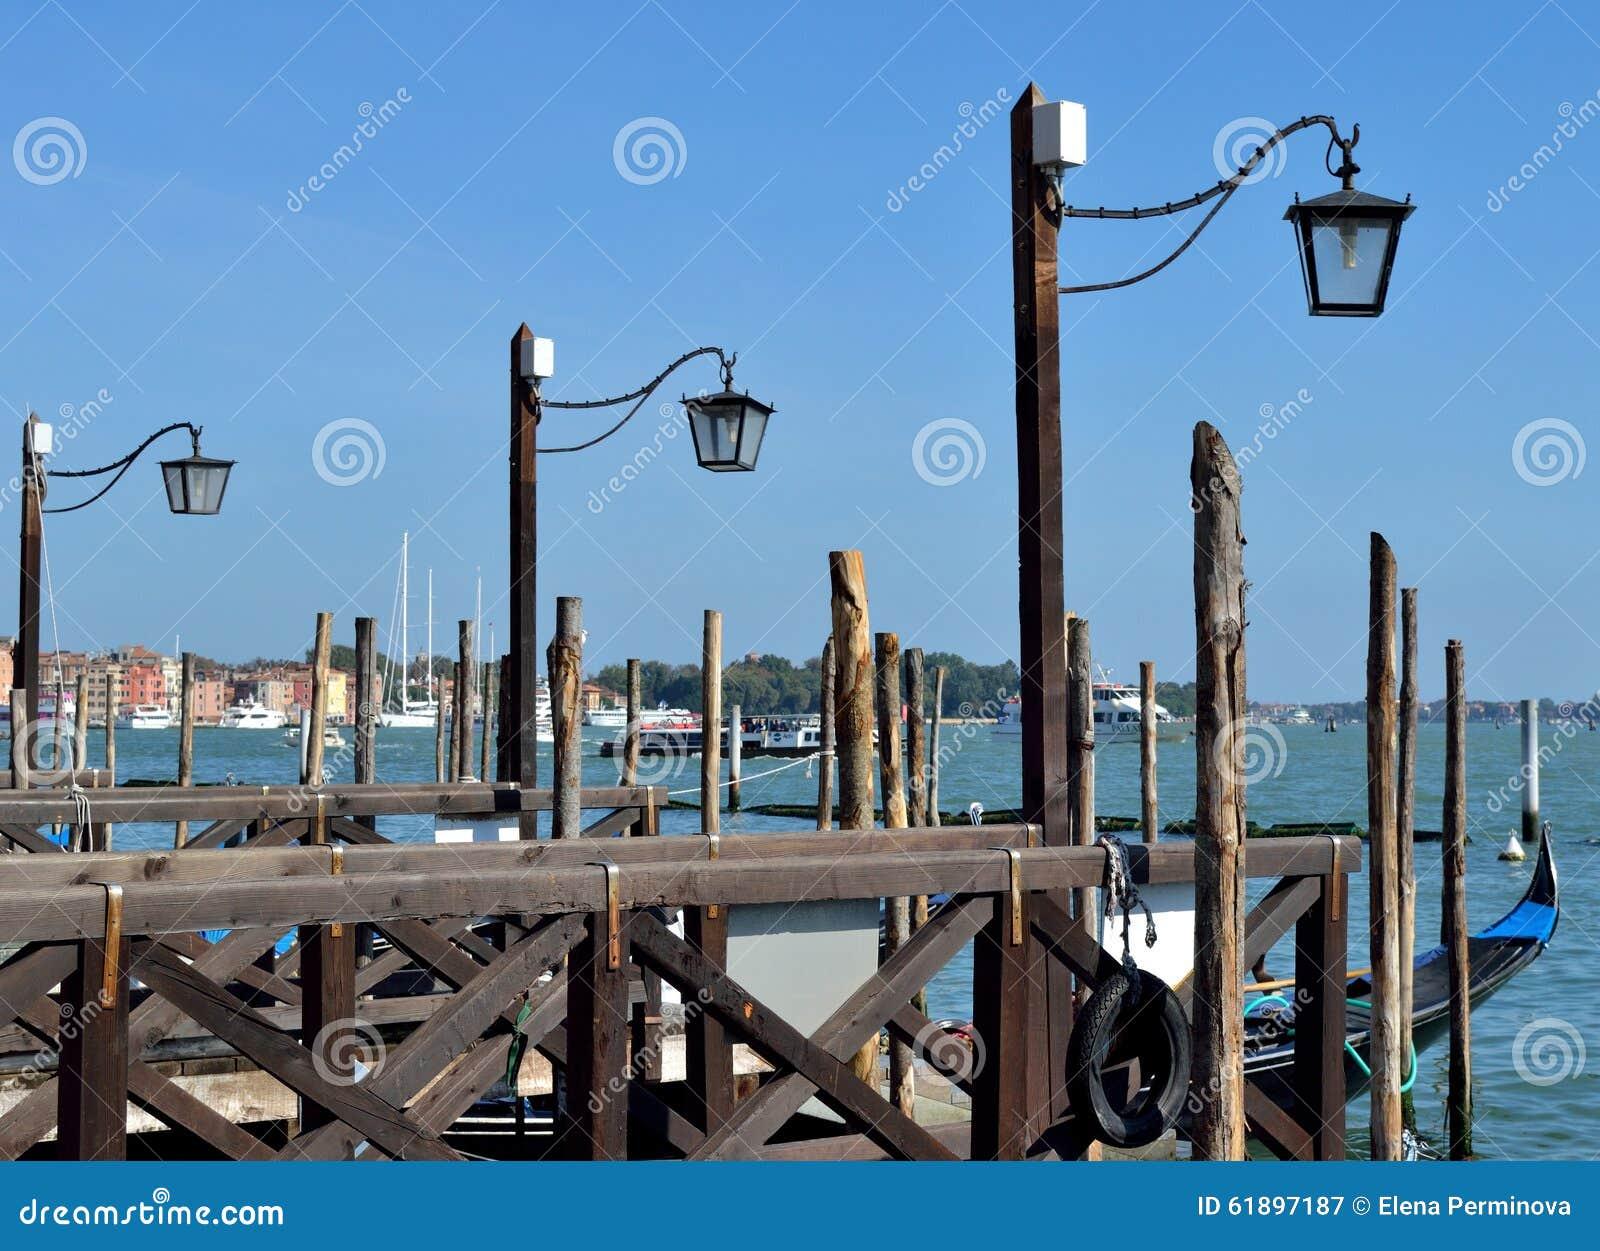 Straatlantaarns op het dok voor gondels in Venetië, Italië